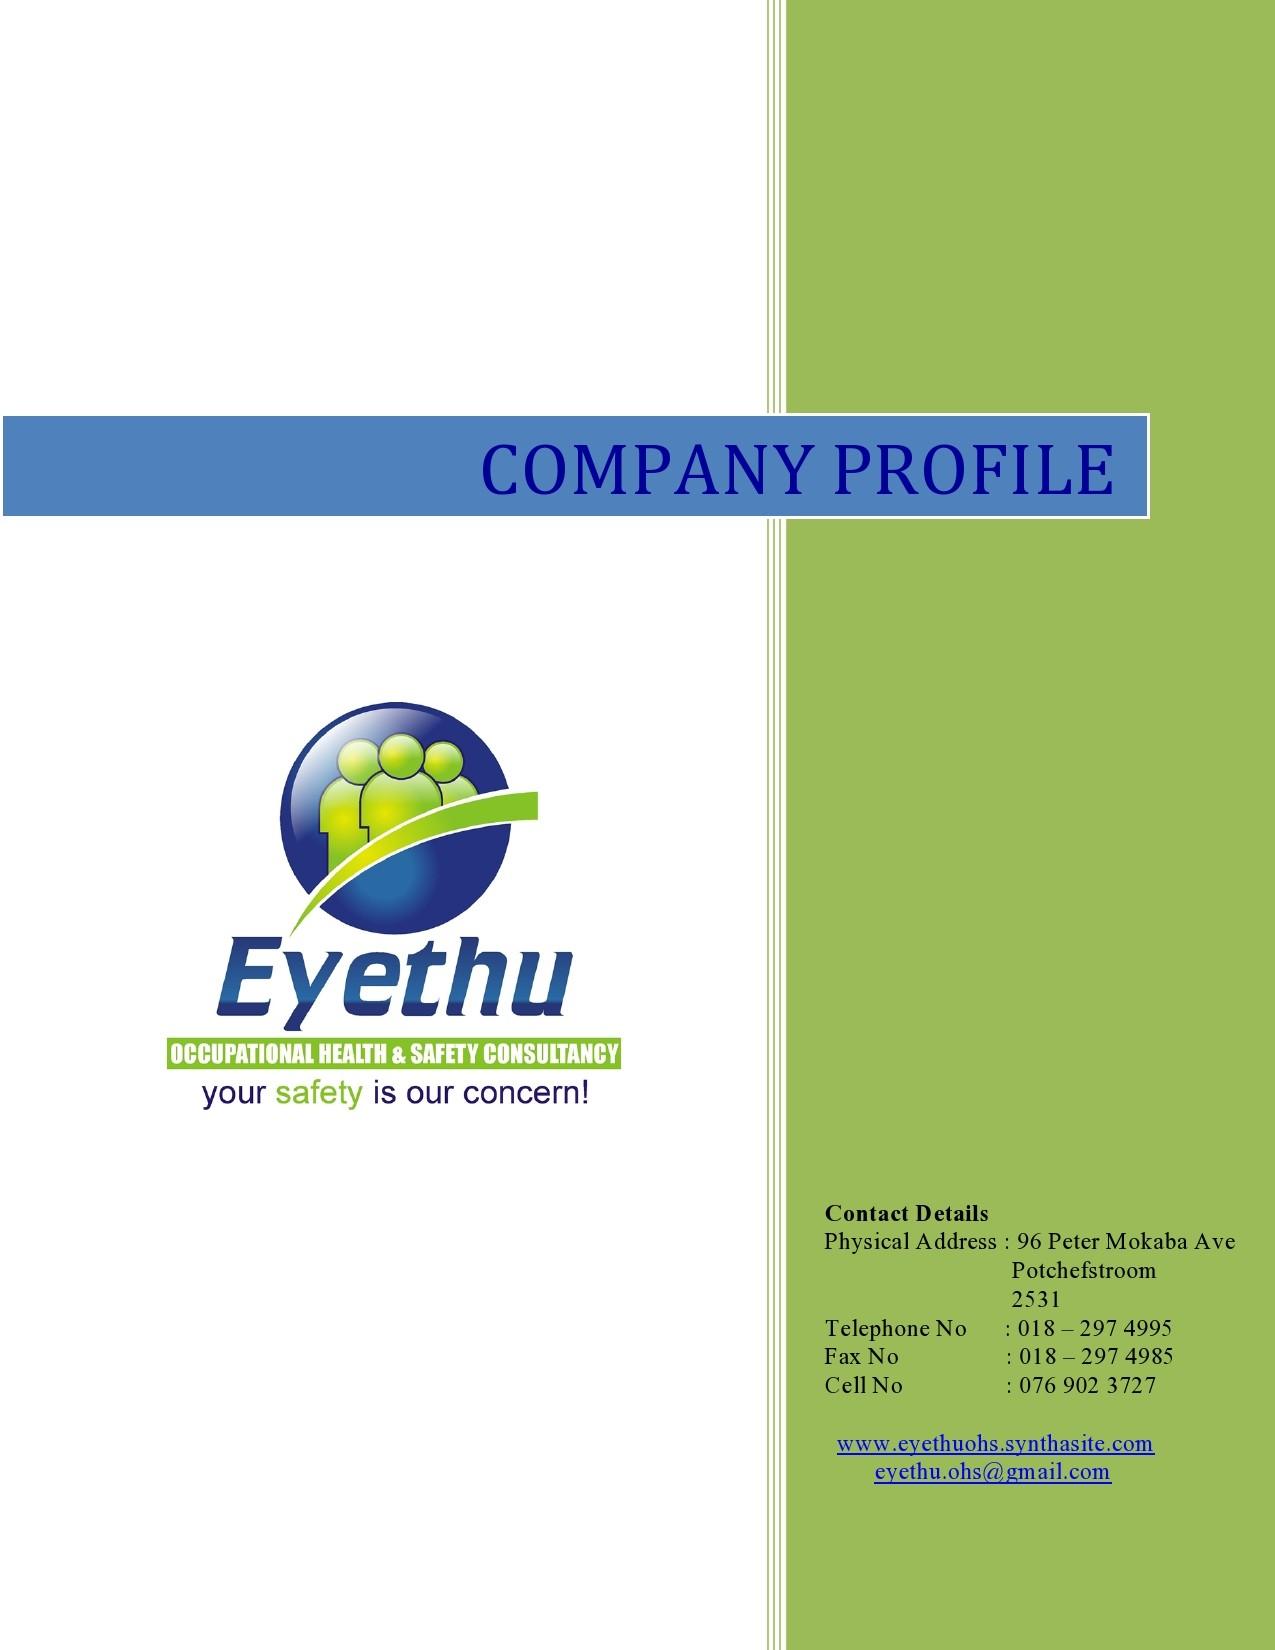 Free company profile template 23